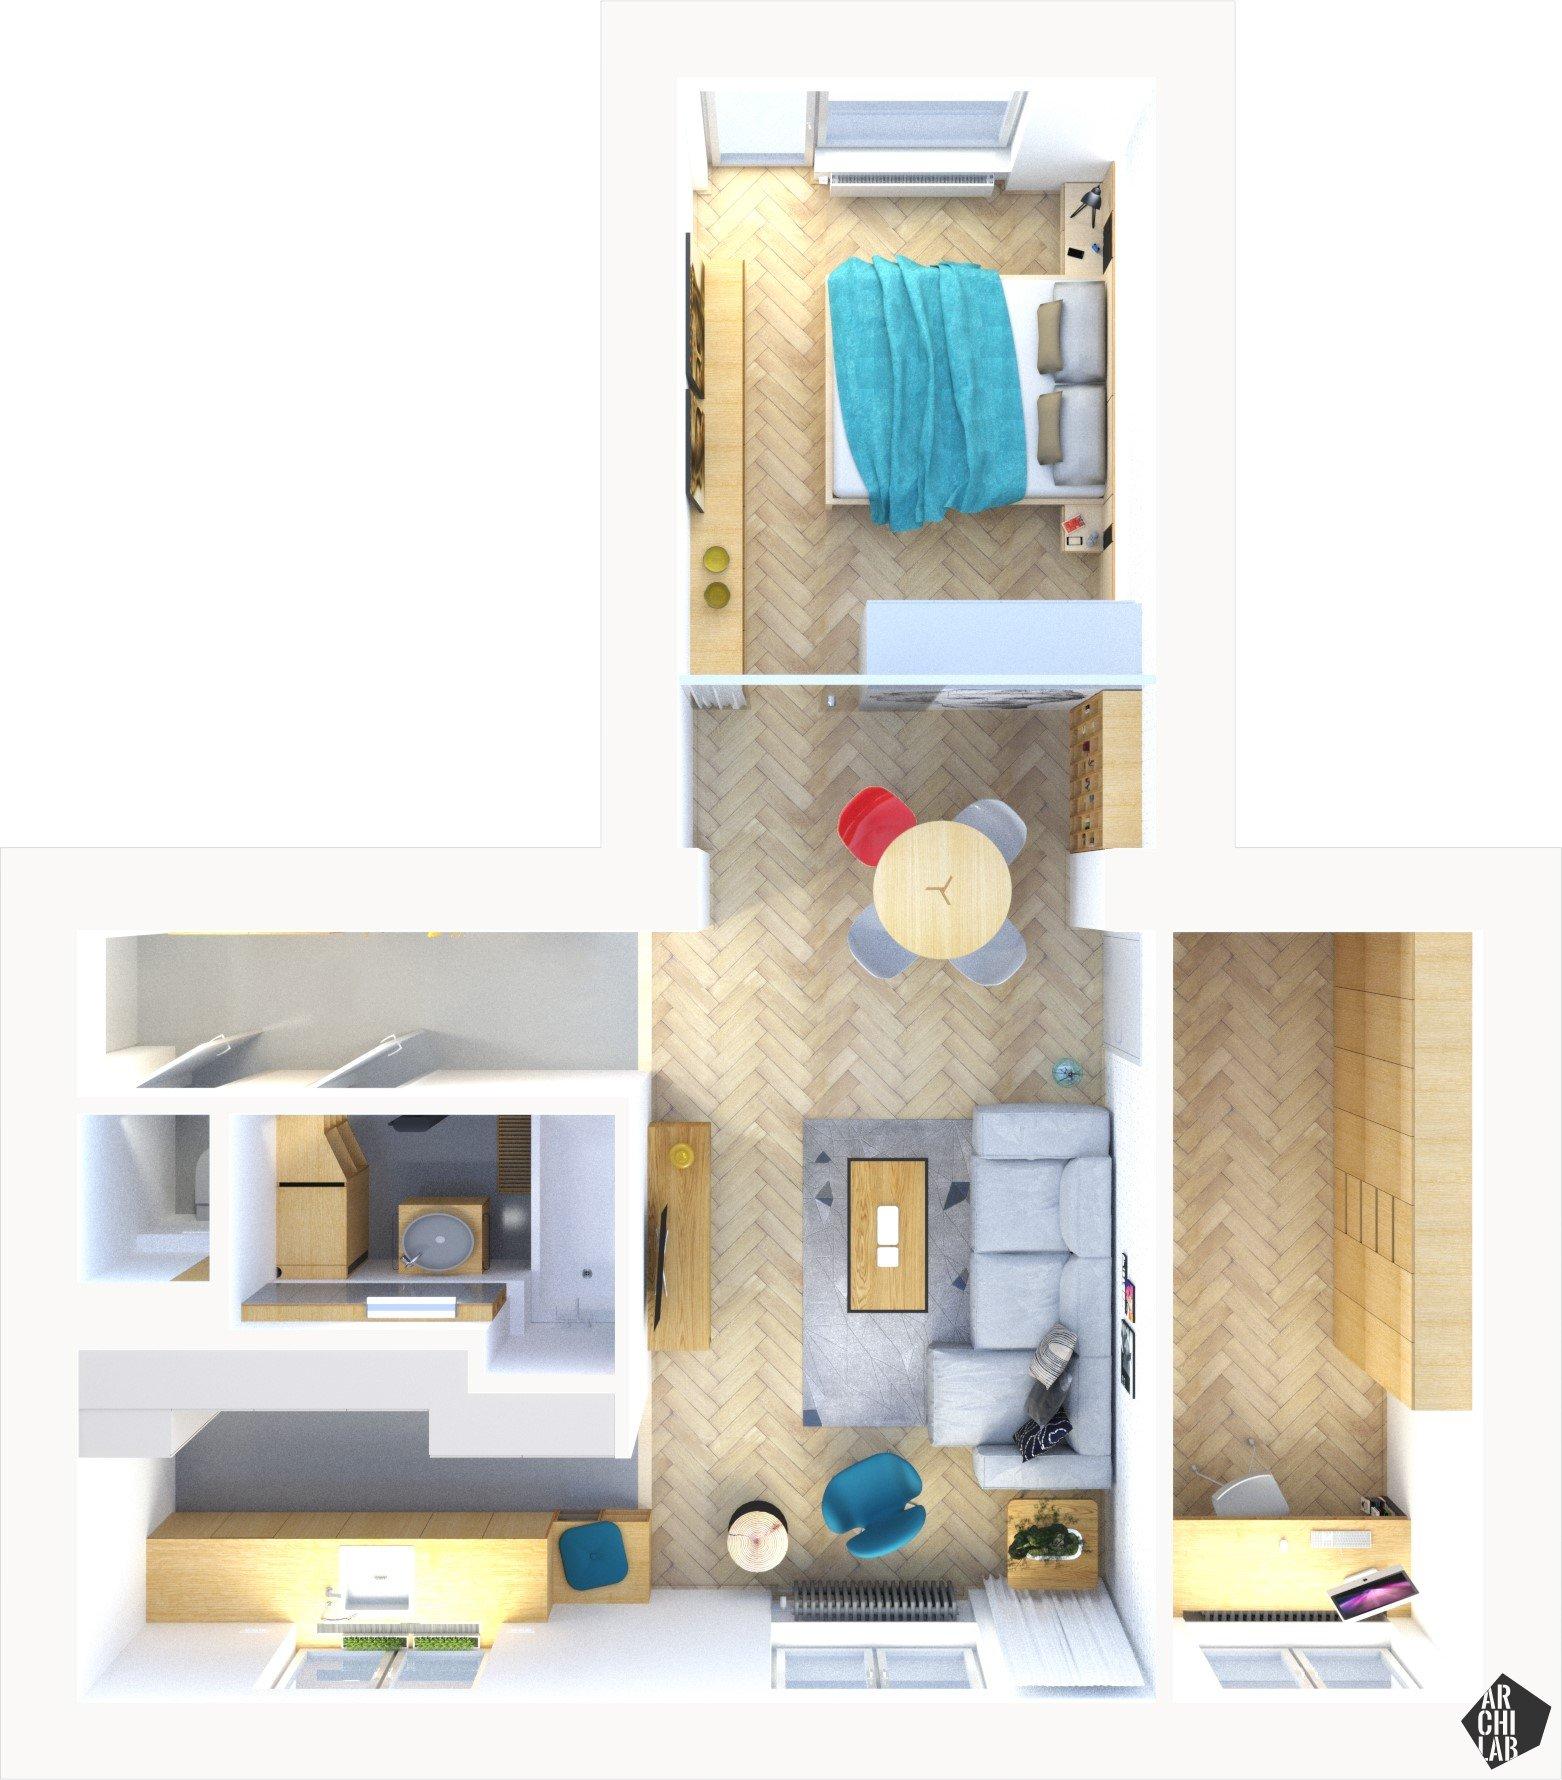 interier-bytu-Strkovecke-jazero-3D-podorys-dispozicia-bytu